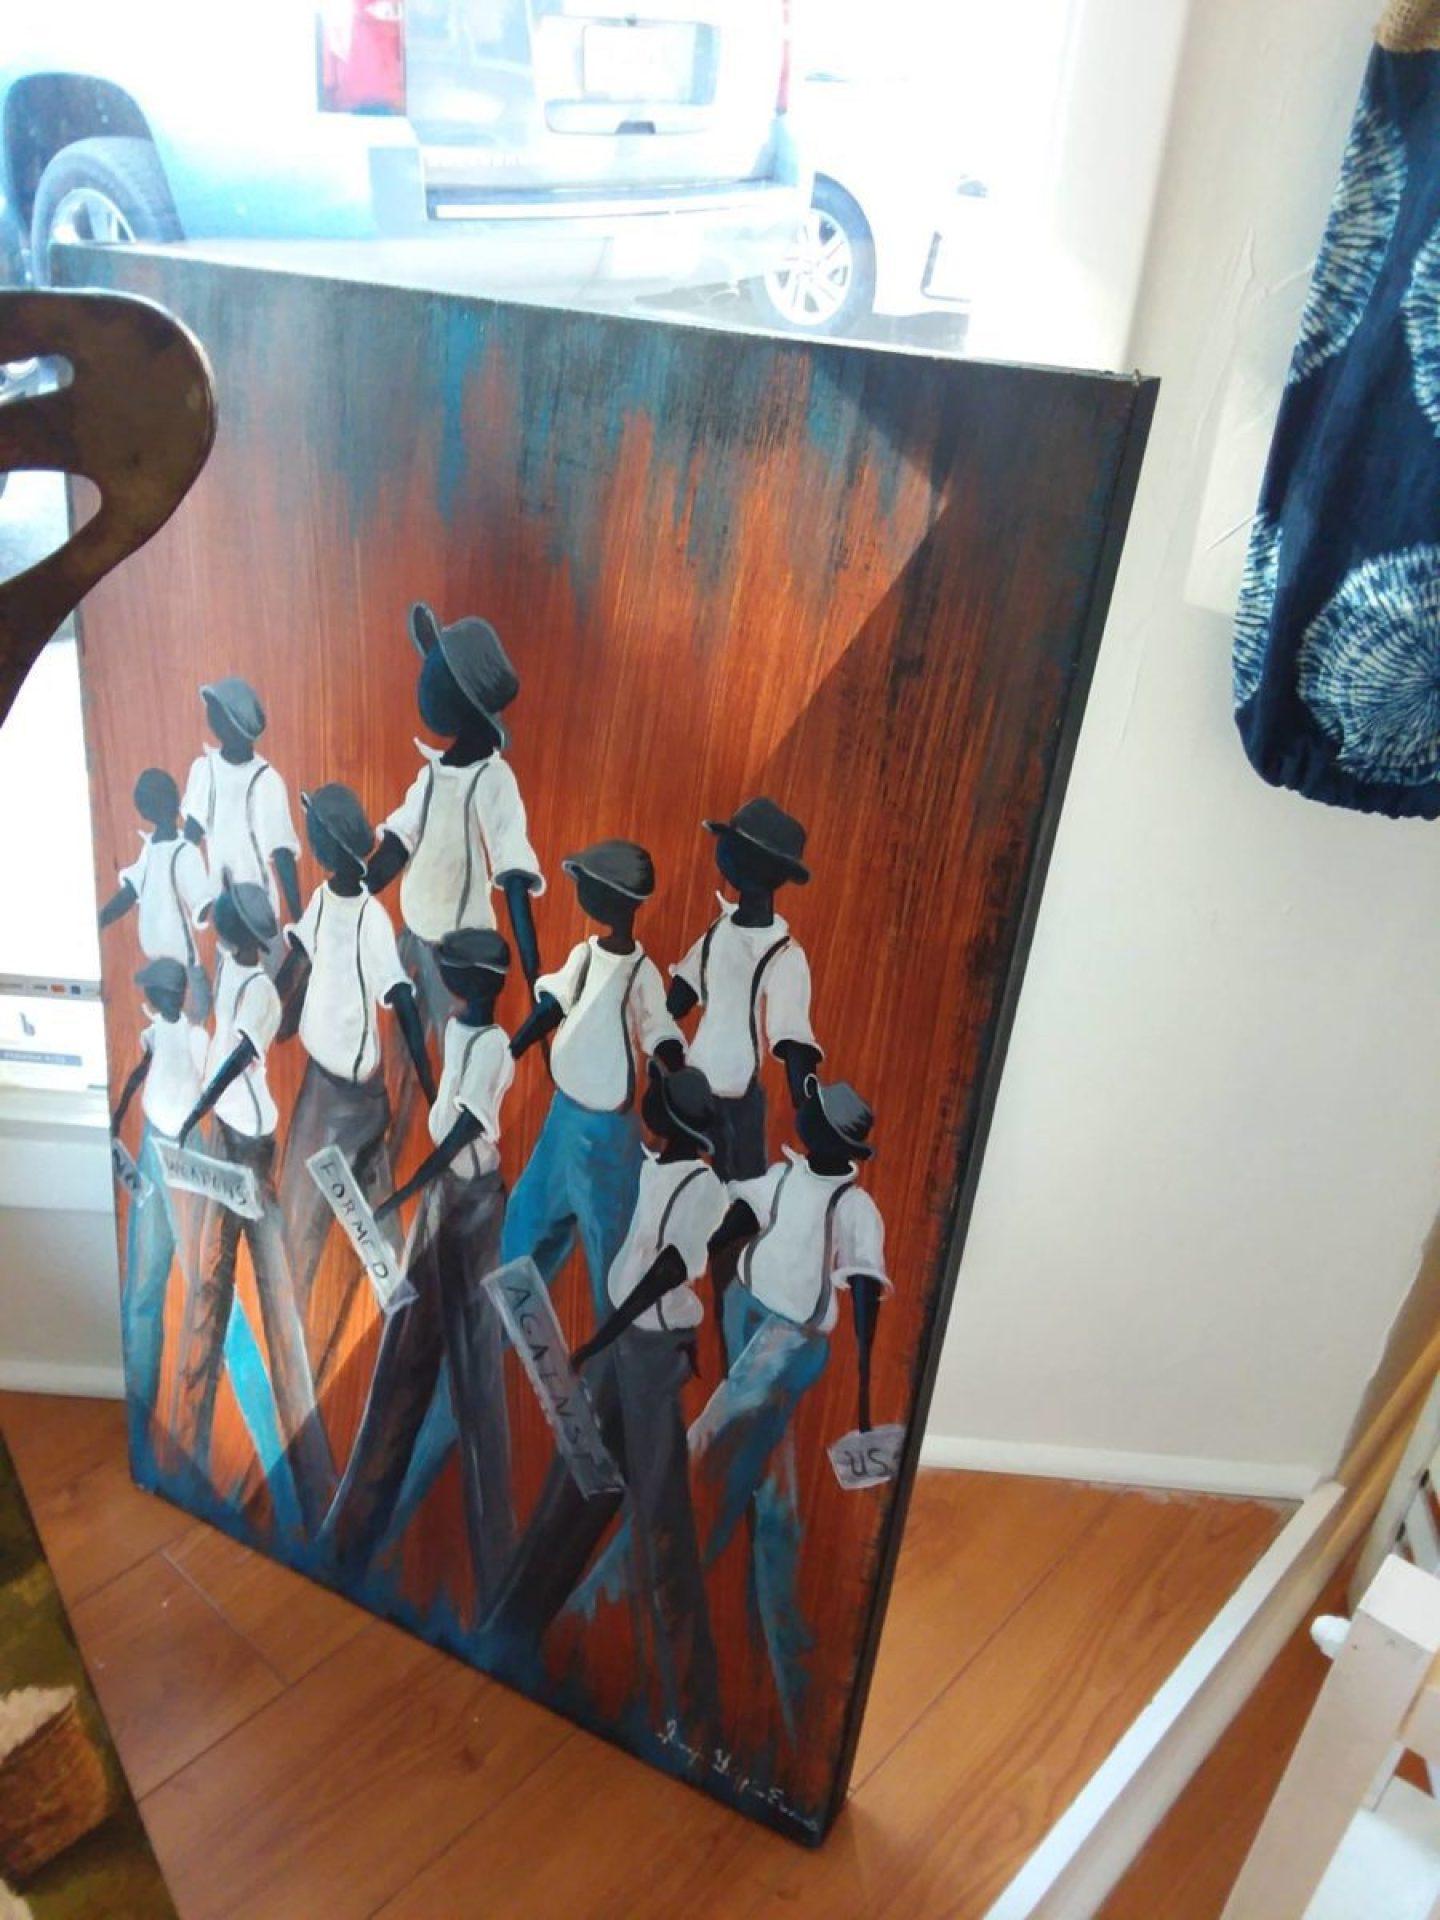 58590350_10215841321120802_2846162960341008384_o-1440x1920 International Cultural Gullah Artist Sonja Griffin Evans Unveils Newest Art Studio